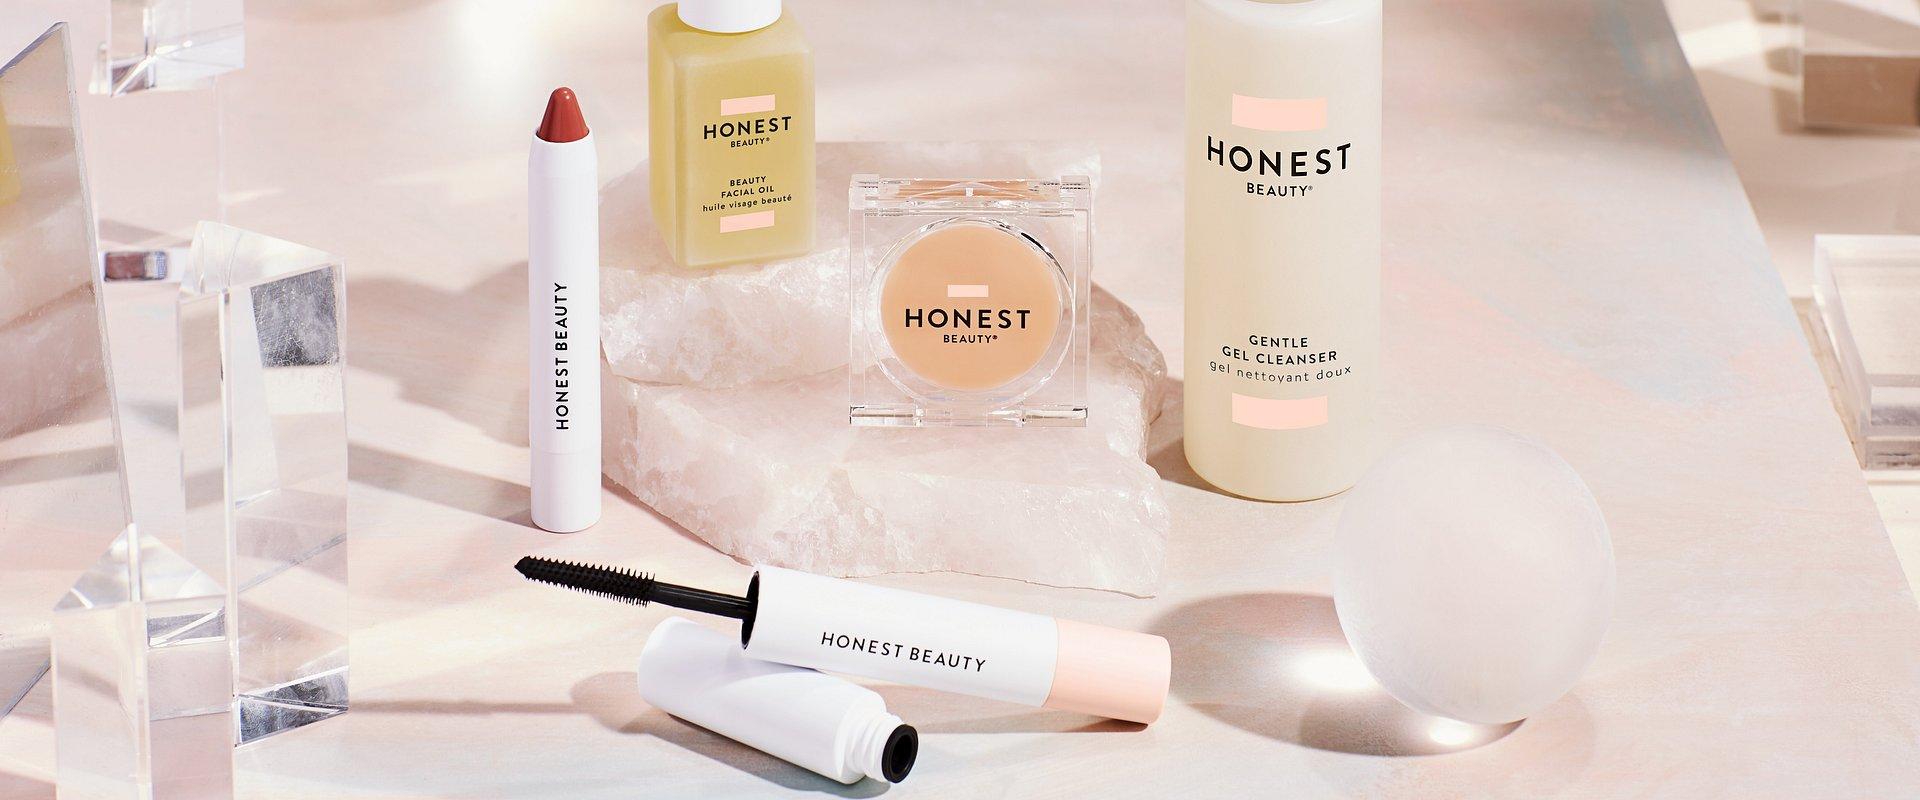 Honest Beauty – piękno bez kompromisów